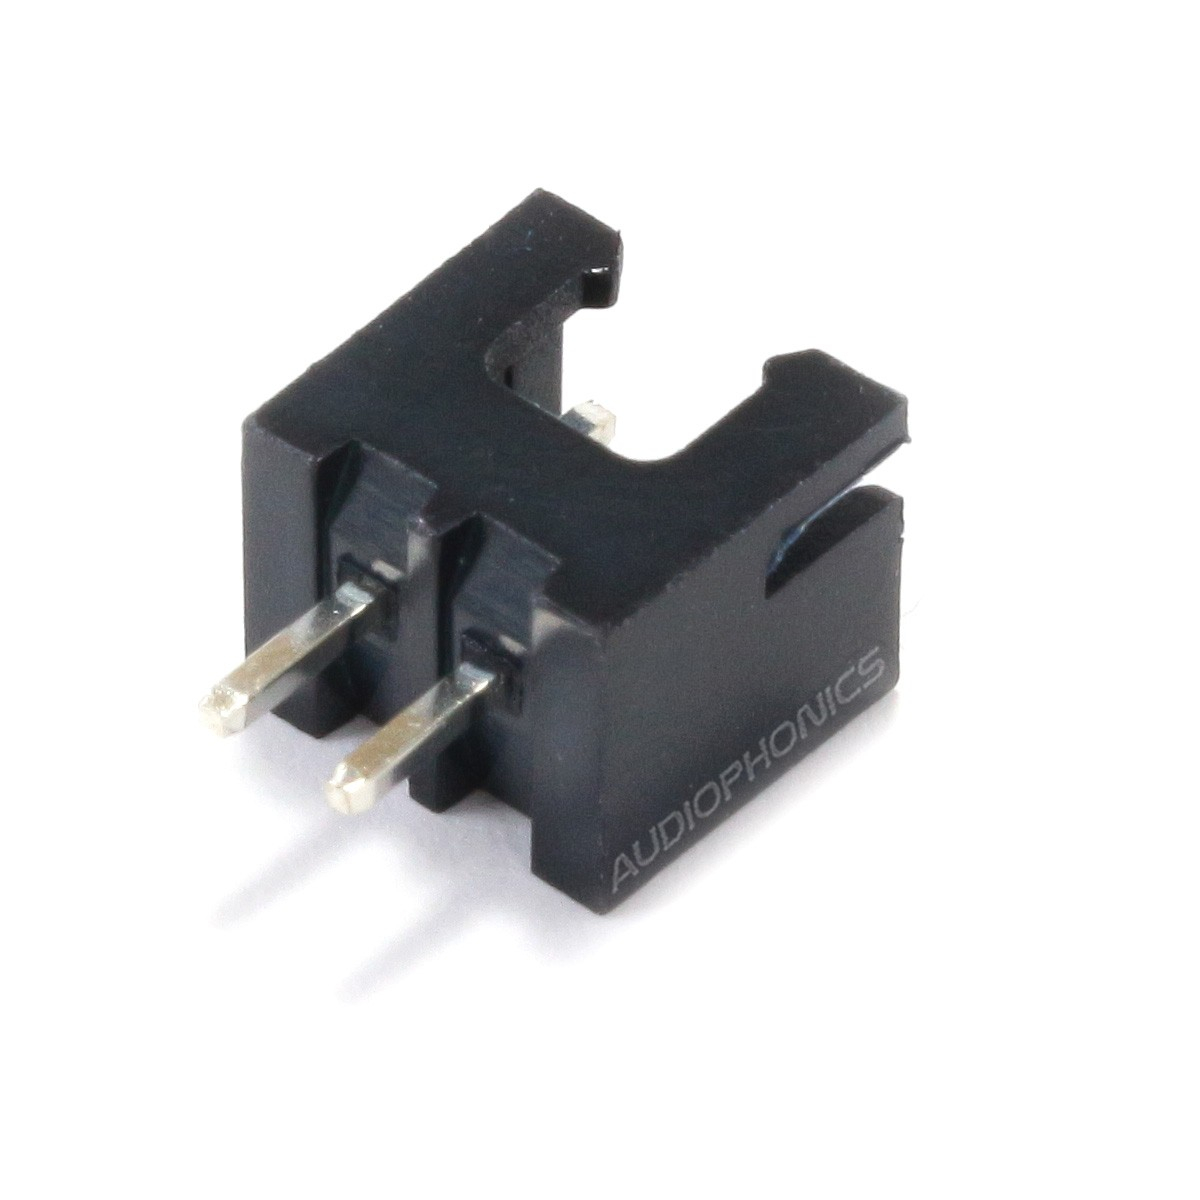 XH 2.54mm Male Socket 2 Channels Black (Unit)